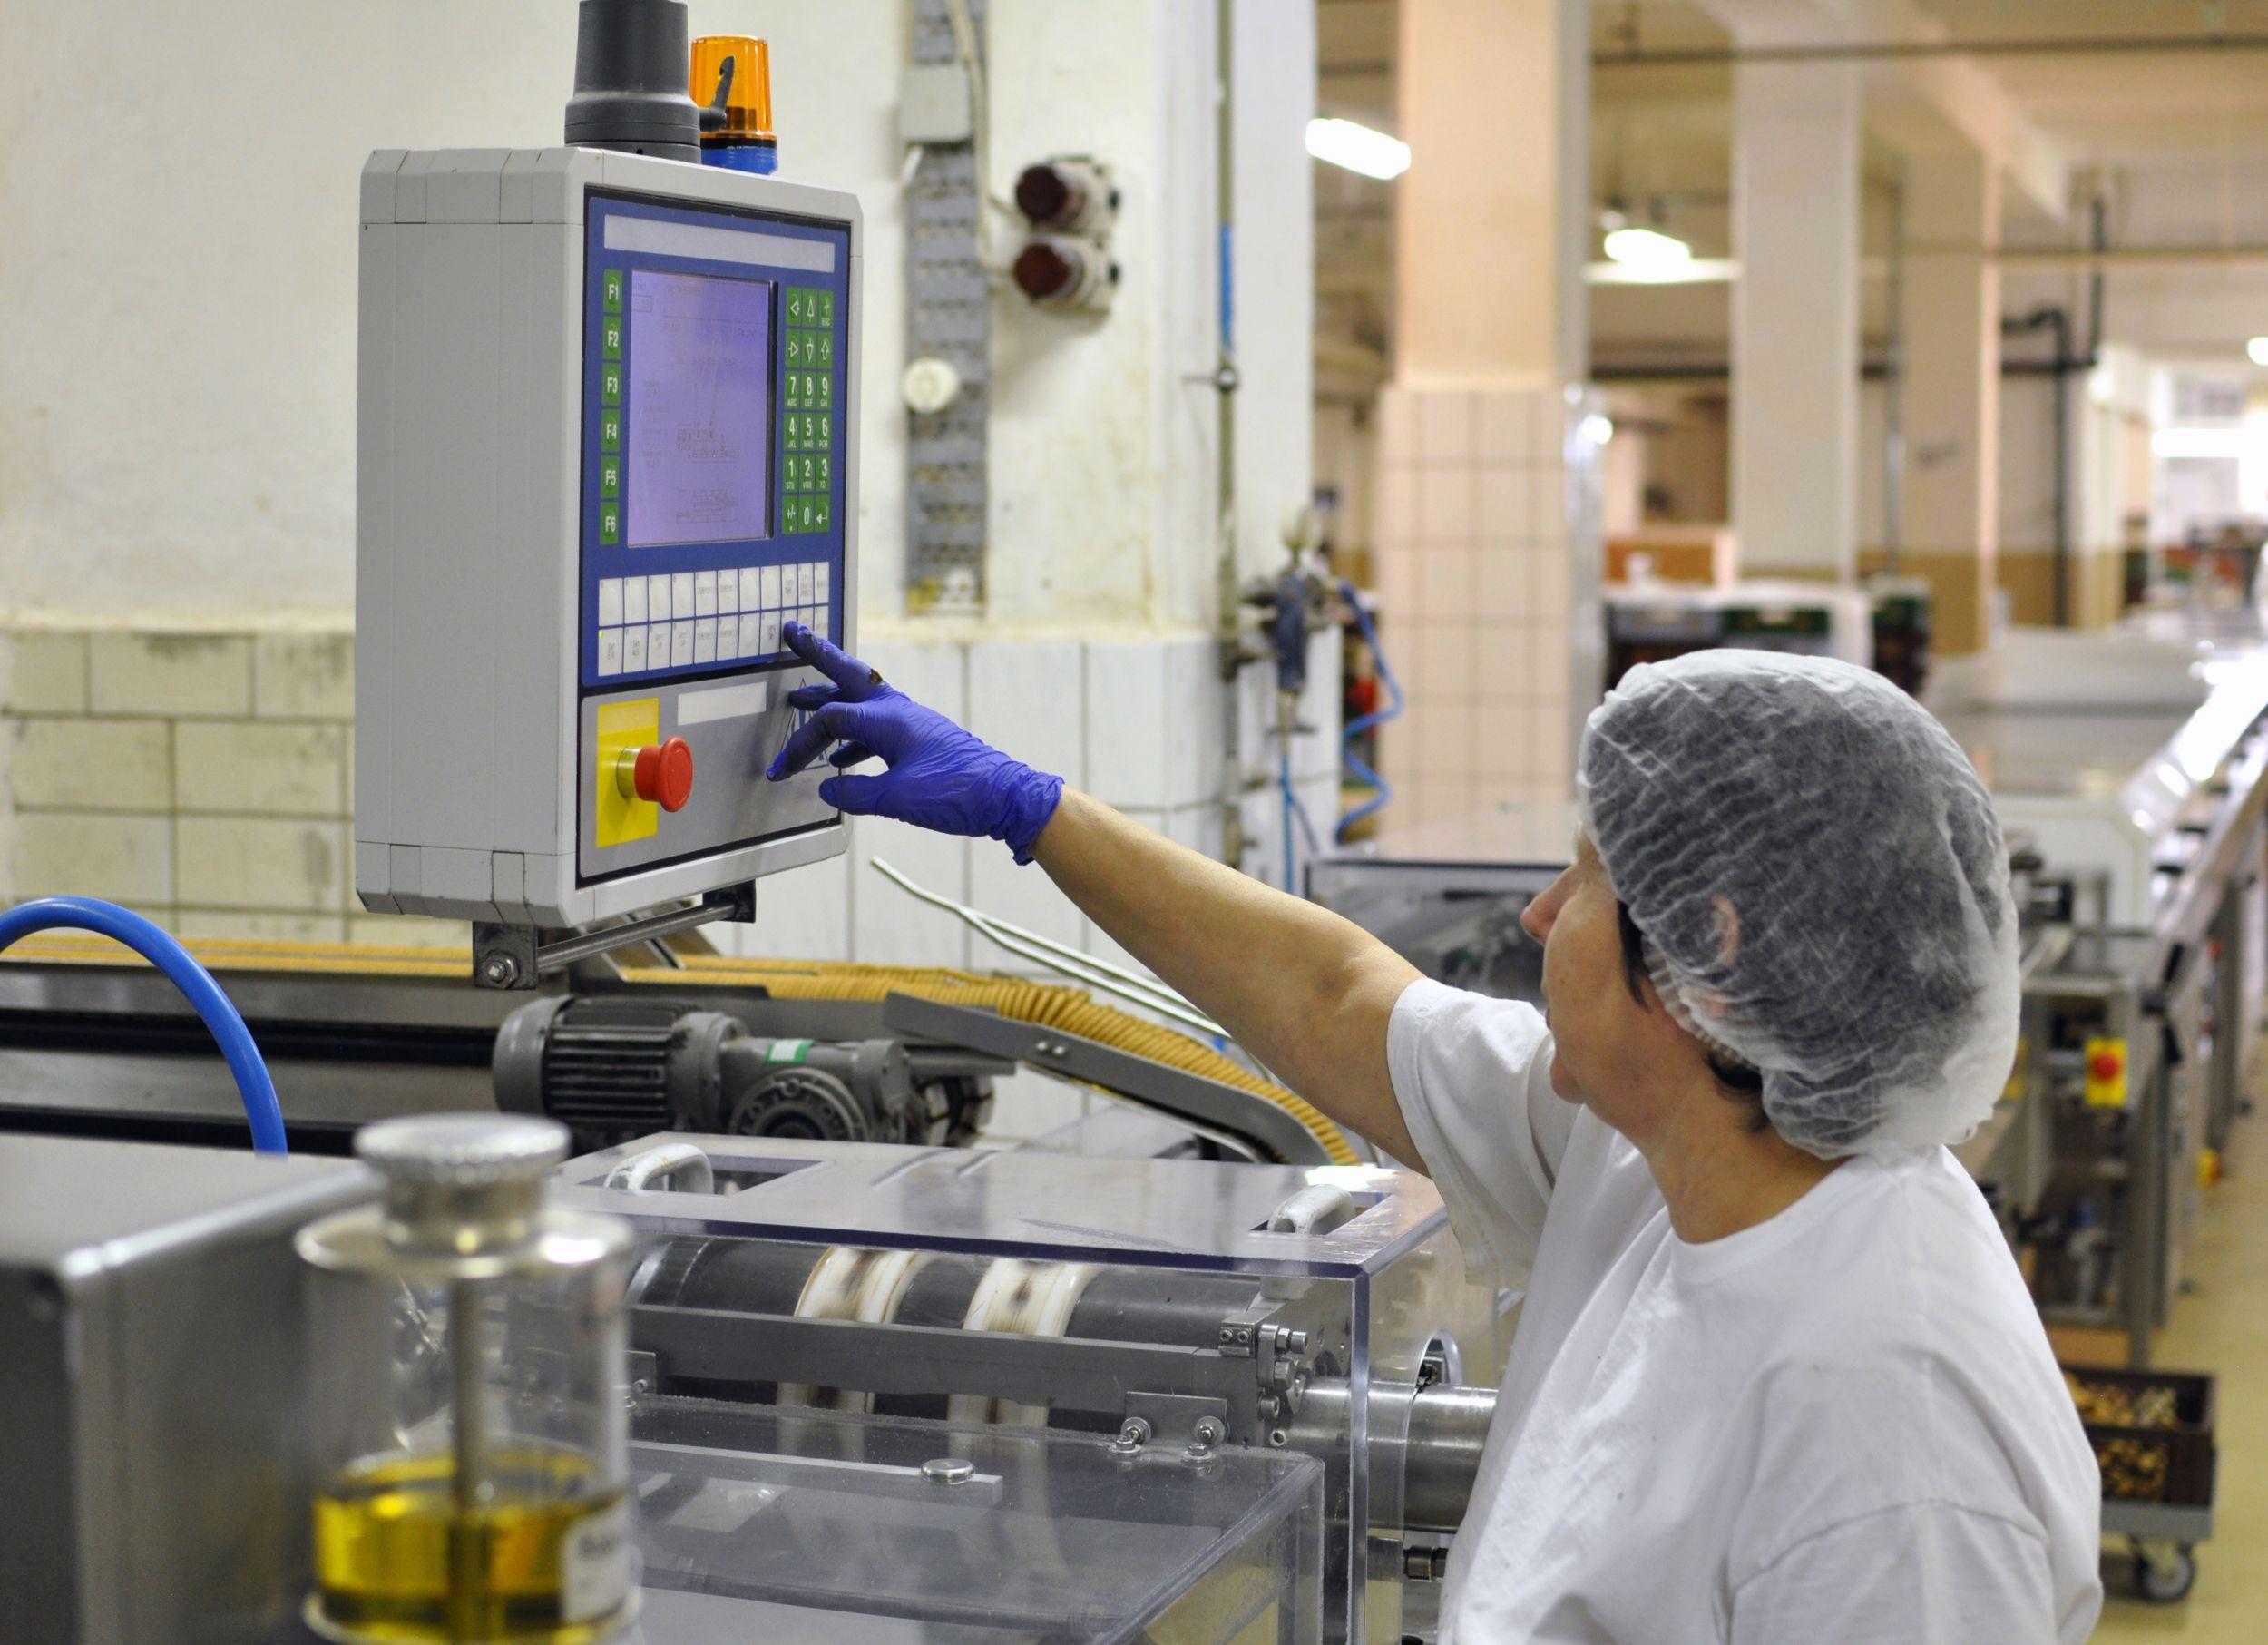 Schutz der Leistungselektronik